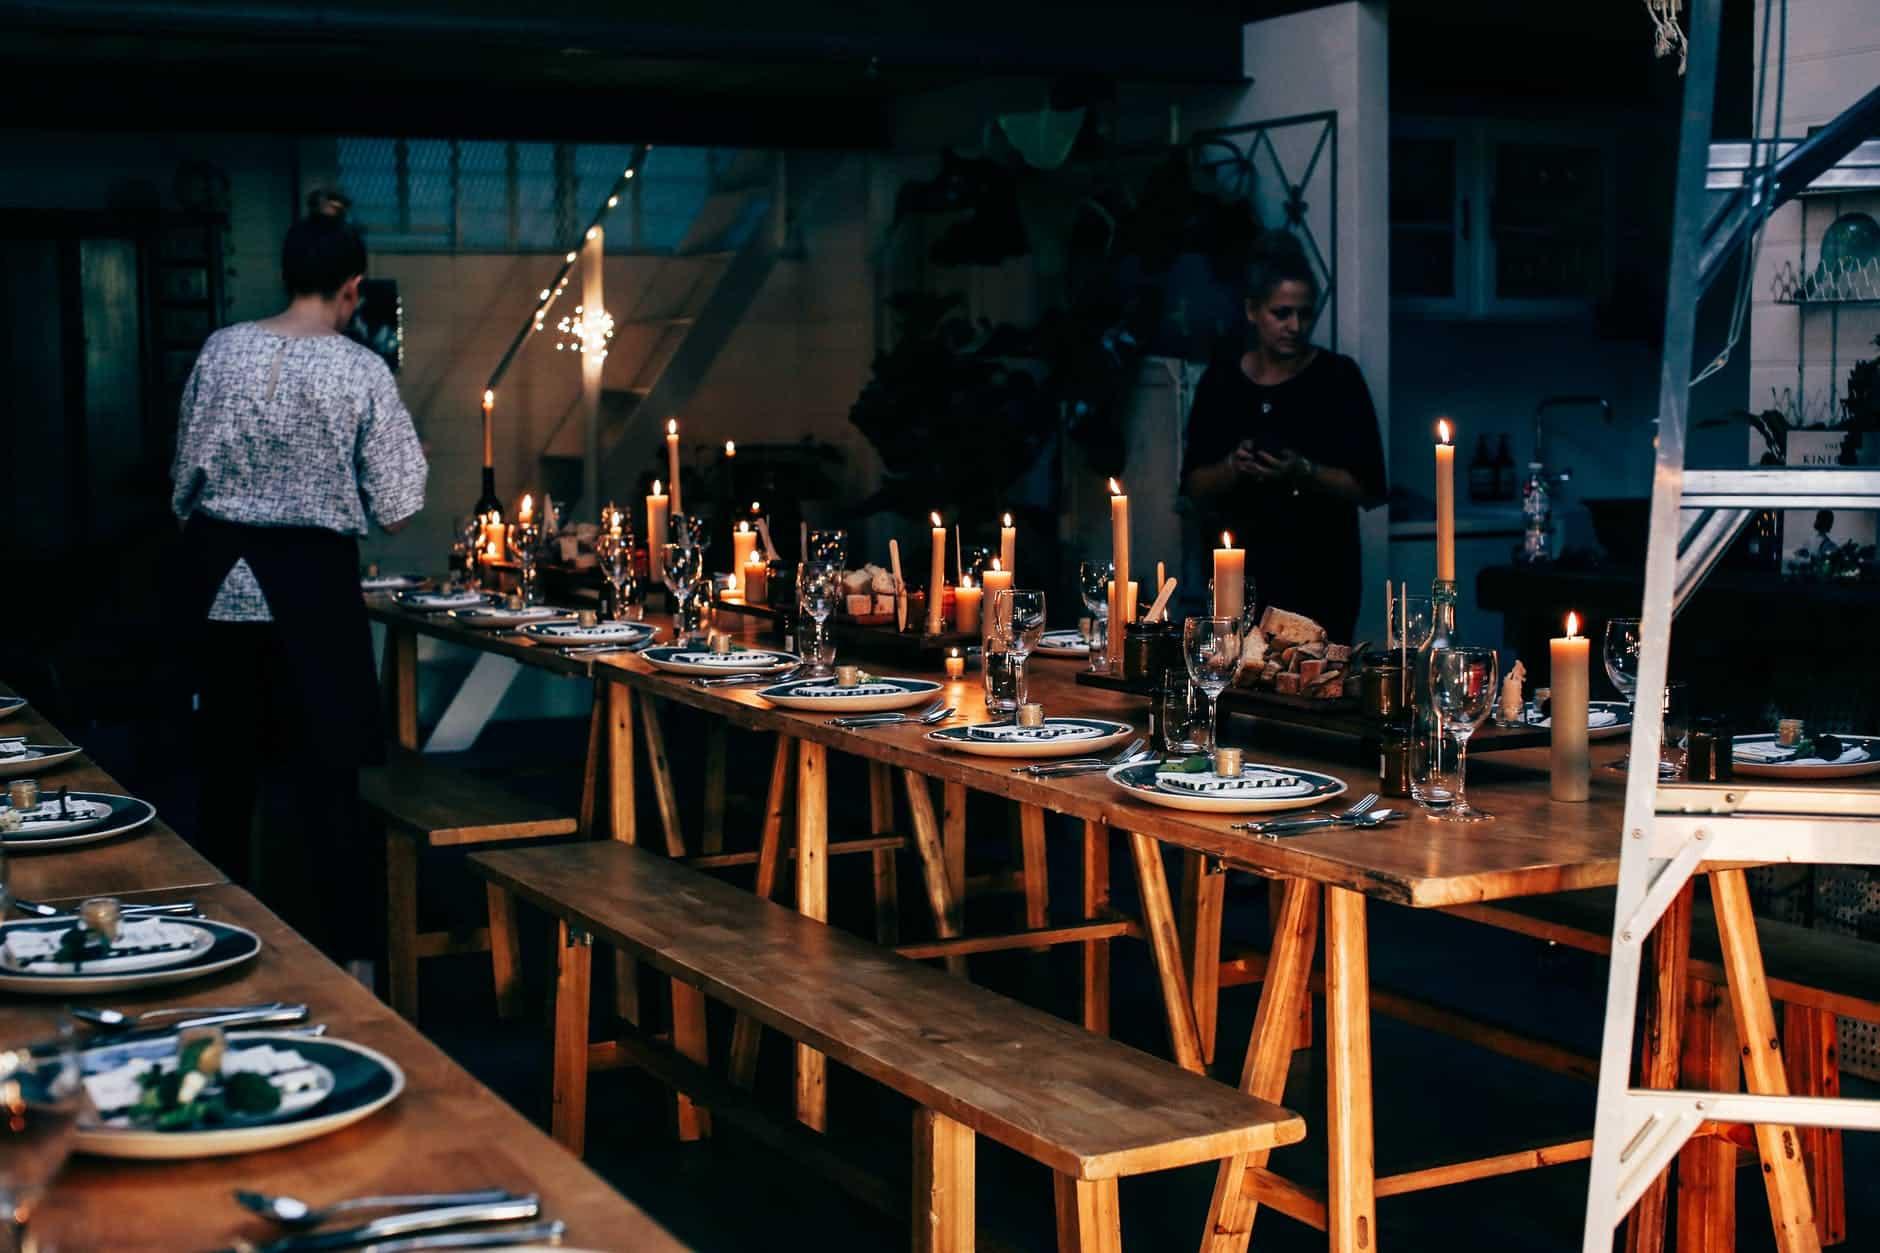 unrecognizable women preparing banquet in modern apartment